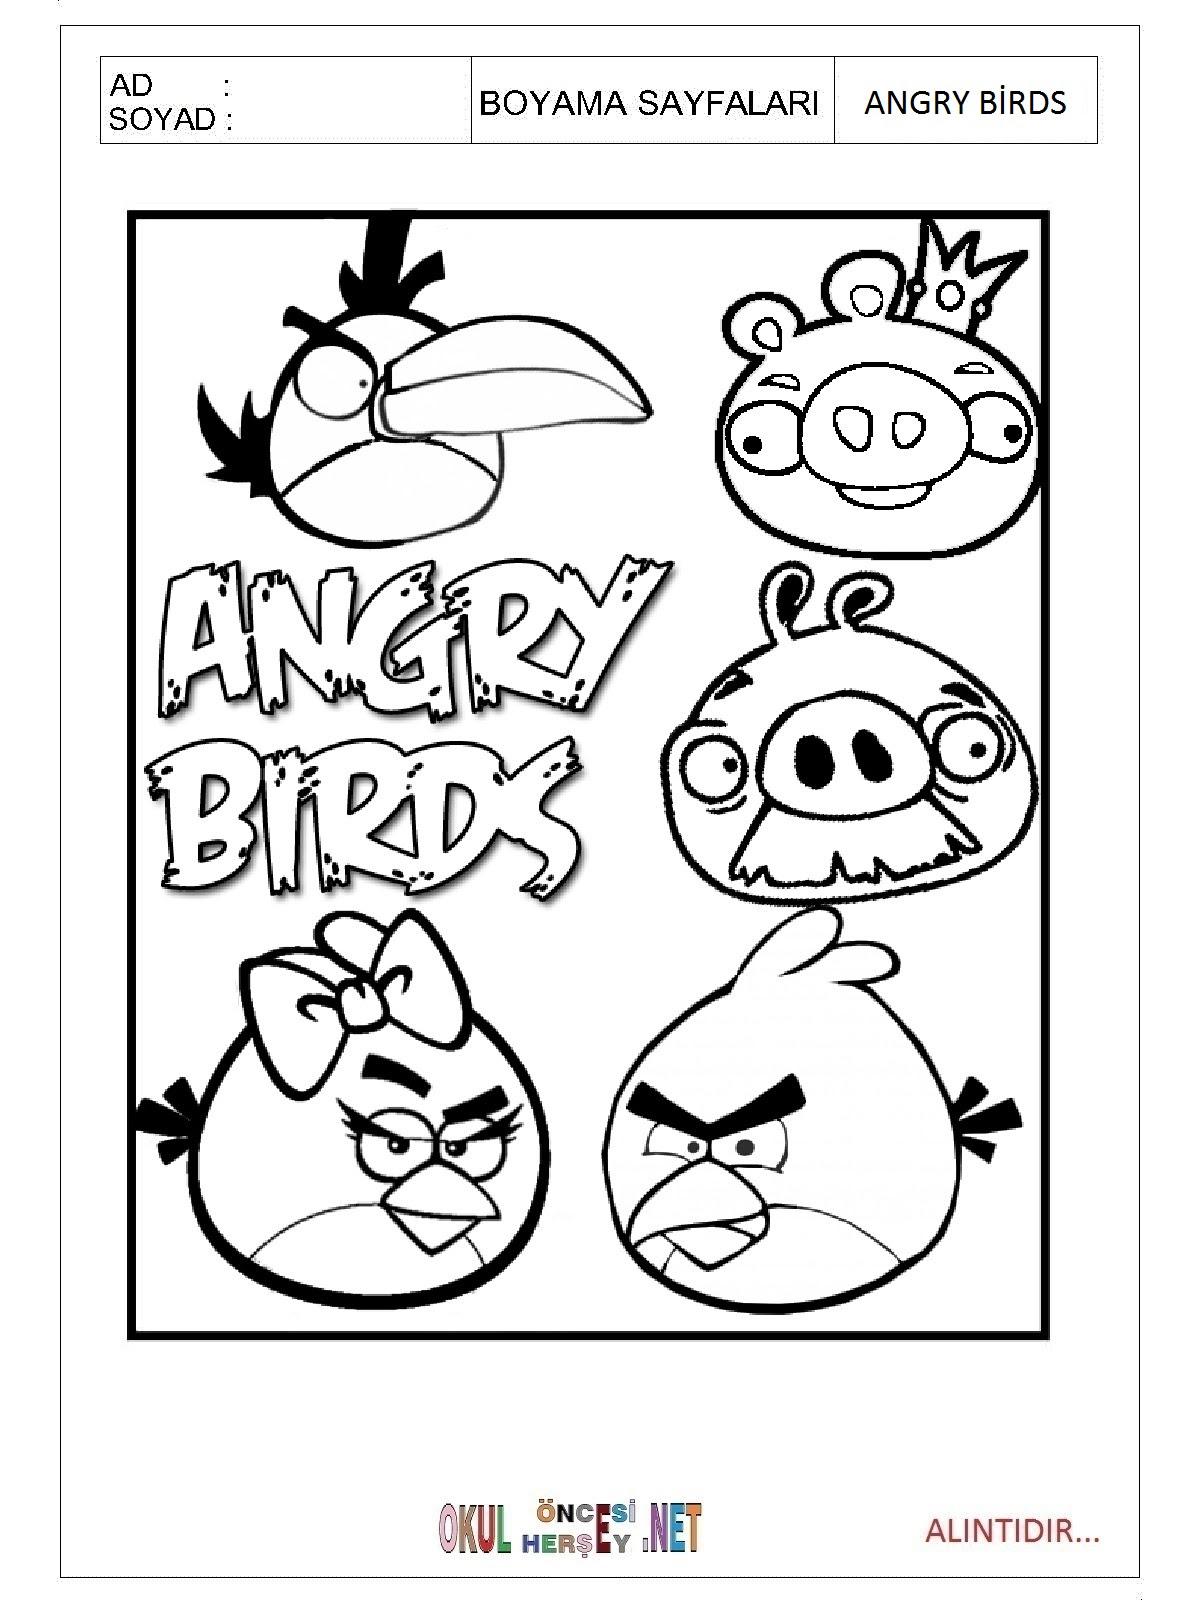 Angry Birds Boyama Kitabi Ust Ev Boyama Sayfasi